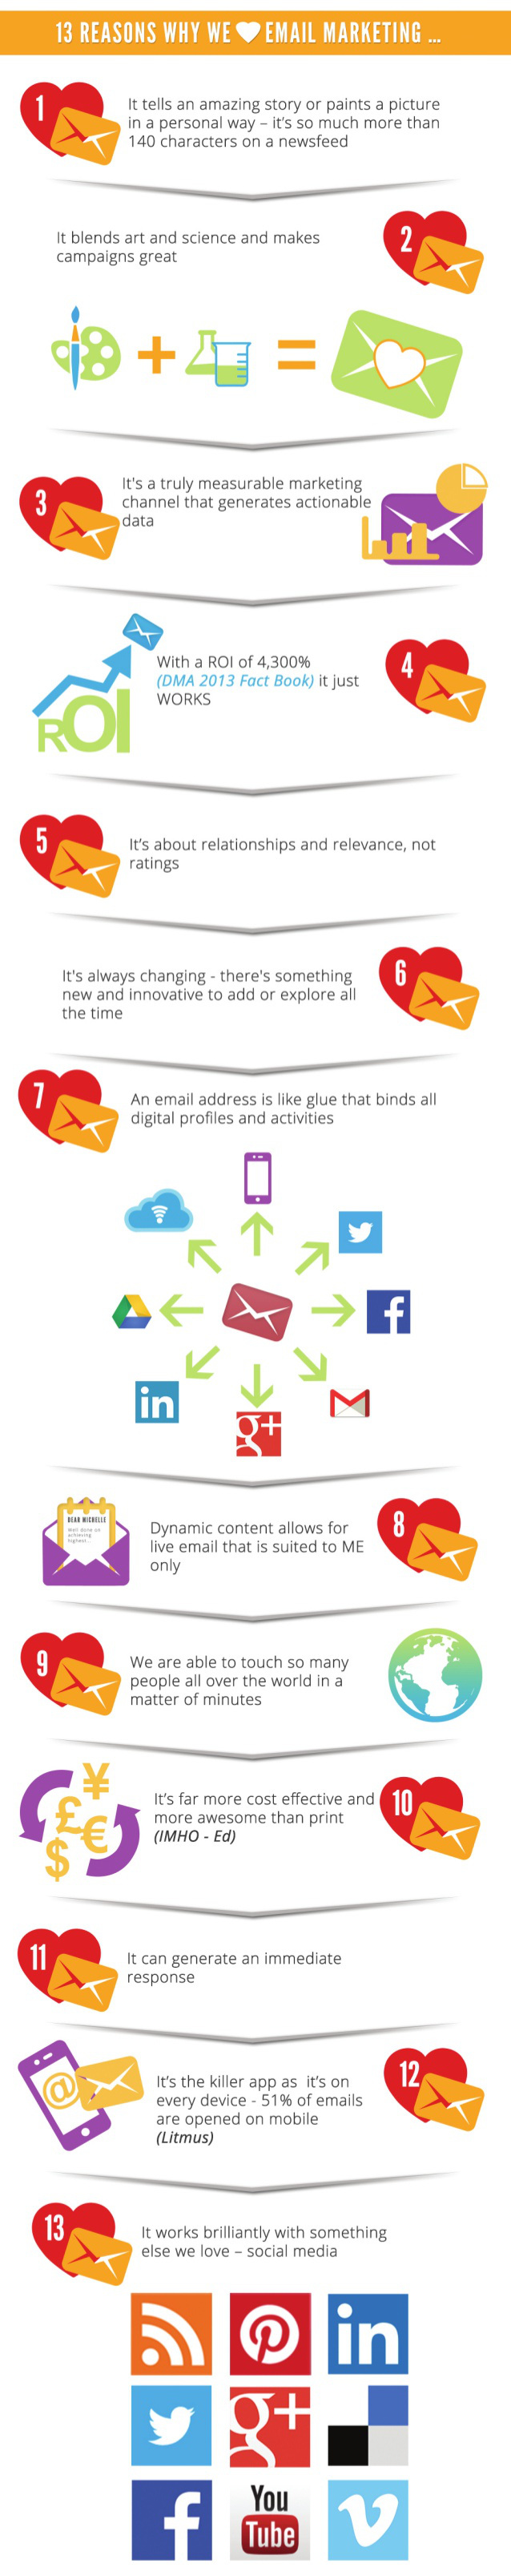 infografia-13-razones-para-amar-el-email-marketing1